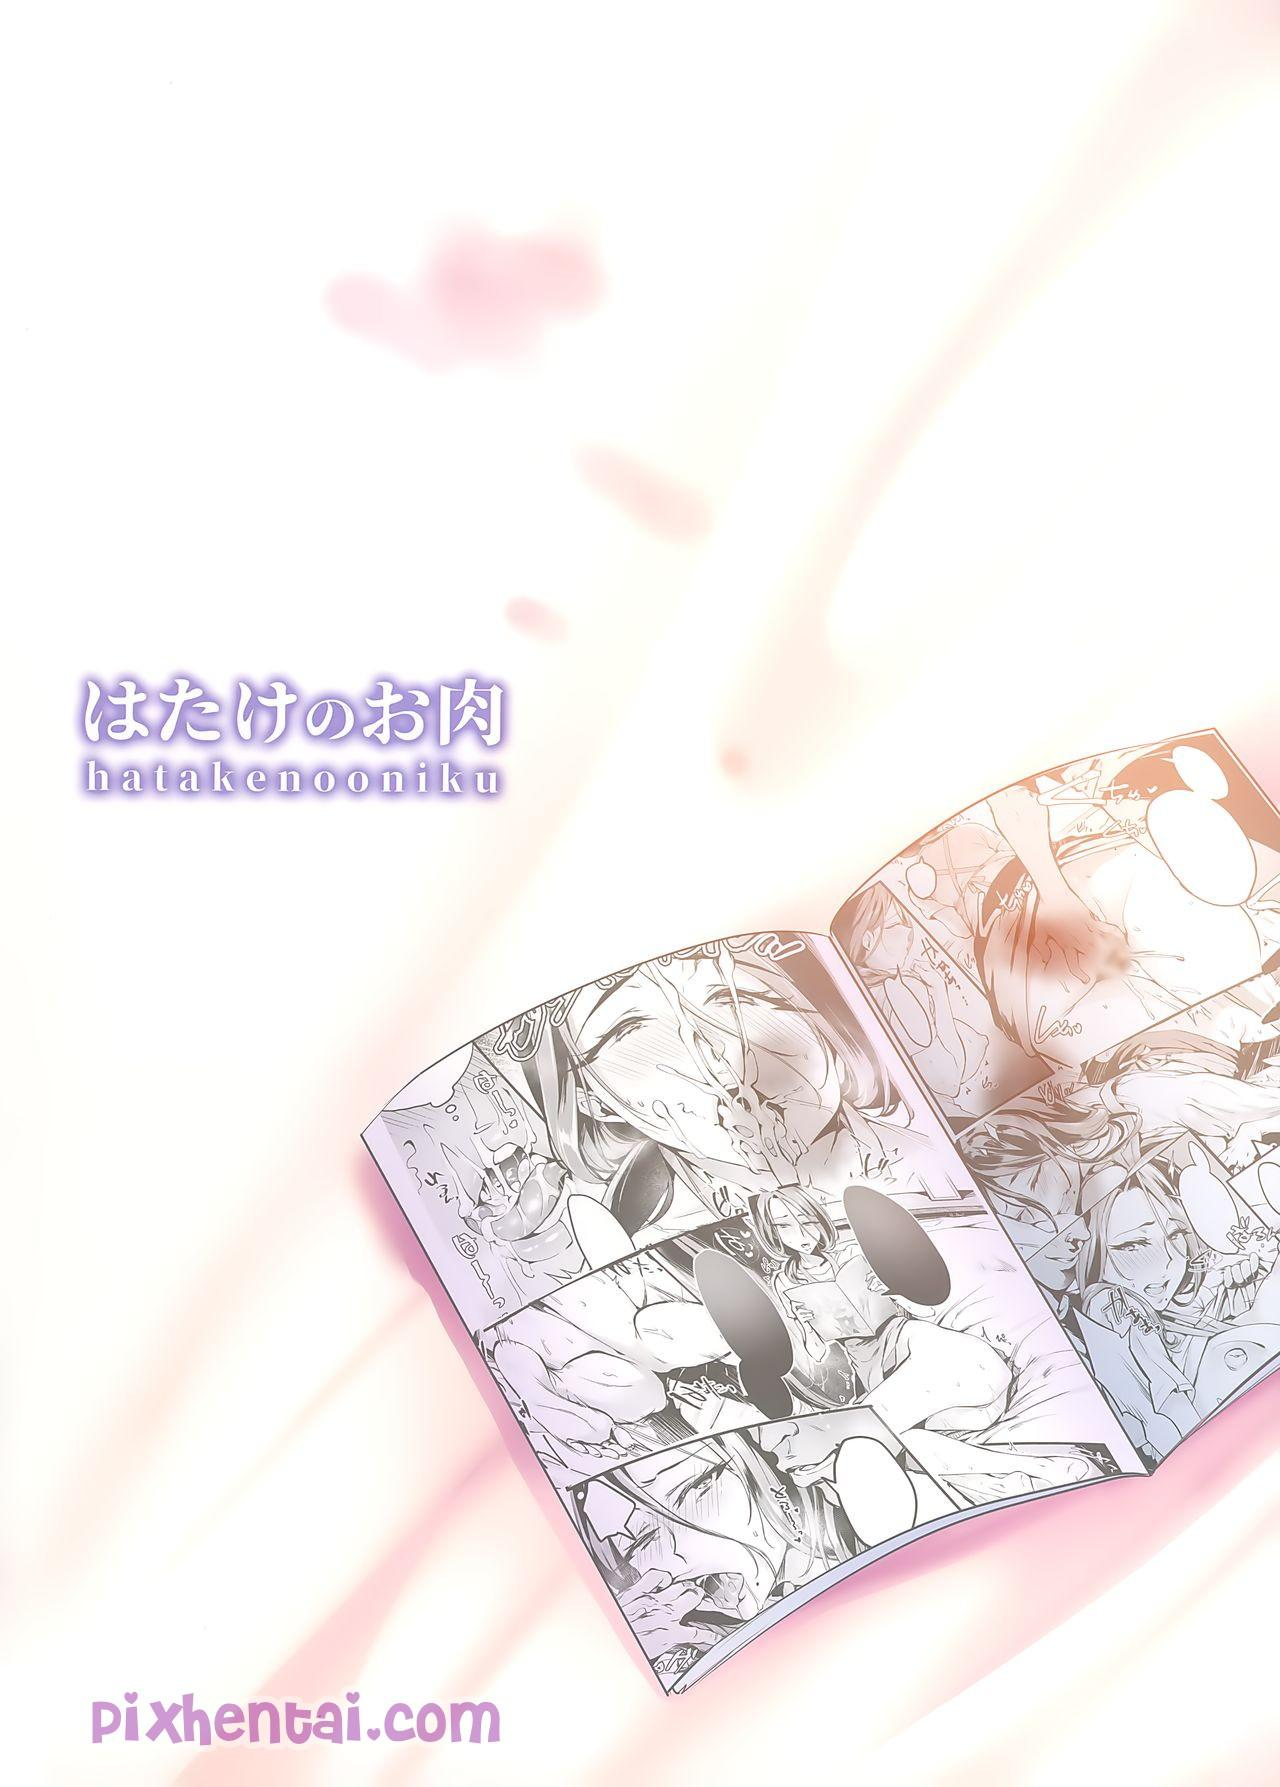 Komik Hentai Milf Bohay Selingkuh dengan Tetangganya Manga XXX Porn Doujin Sex Bokep 19